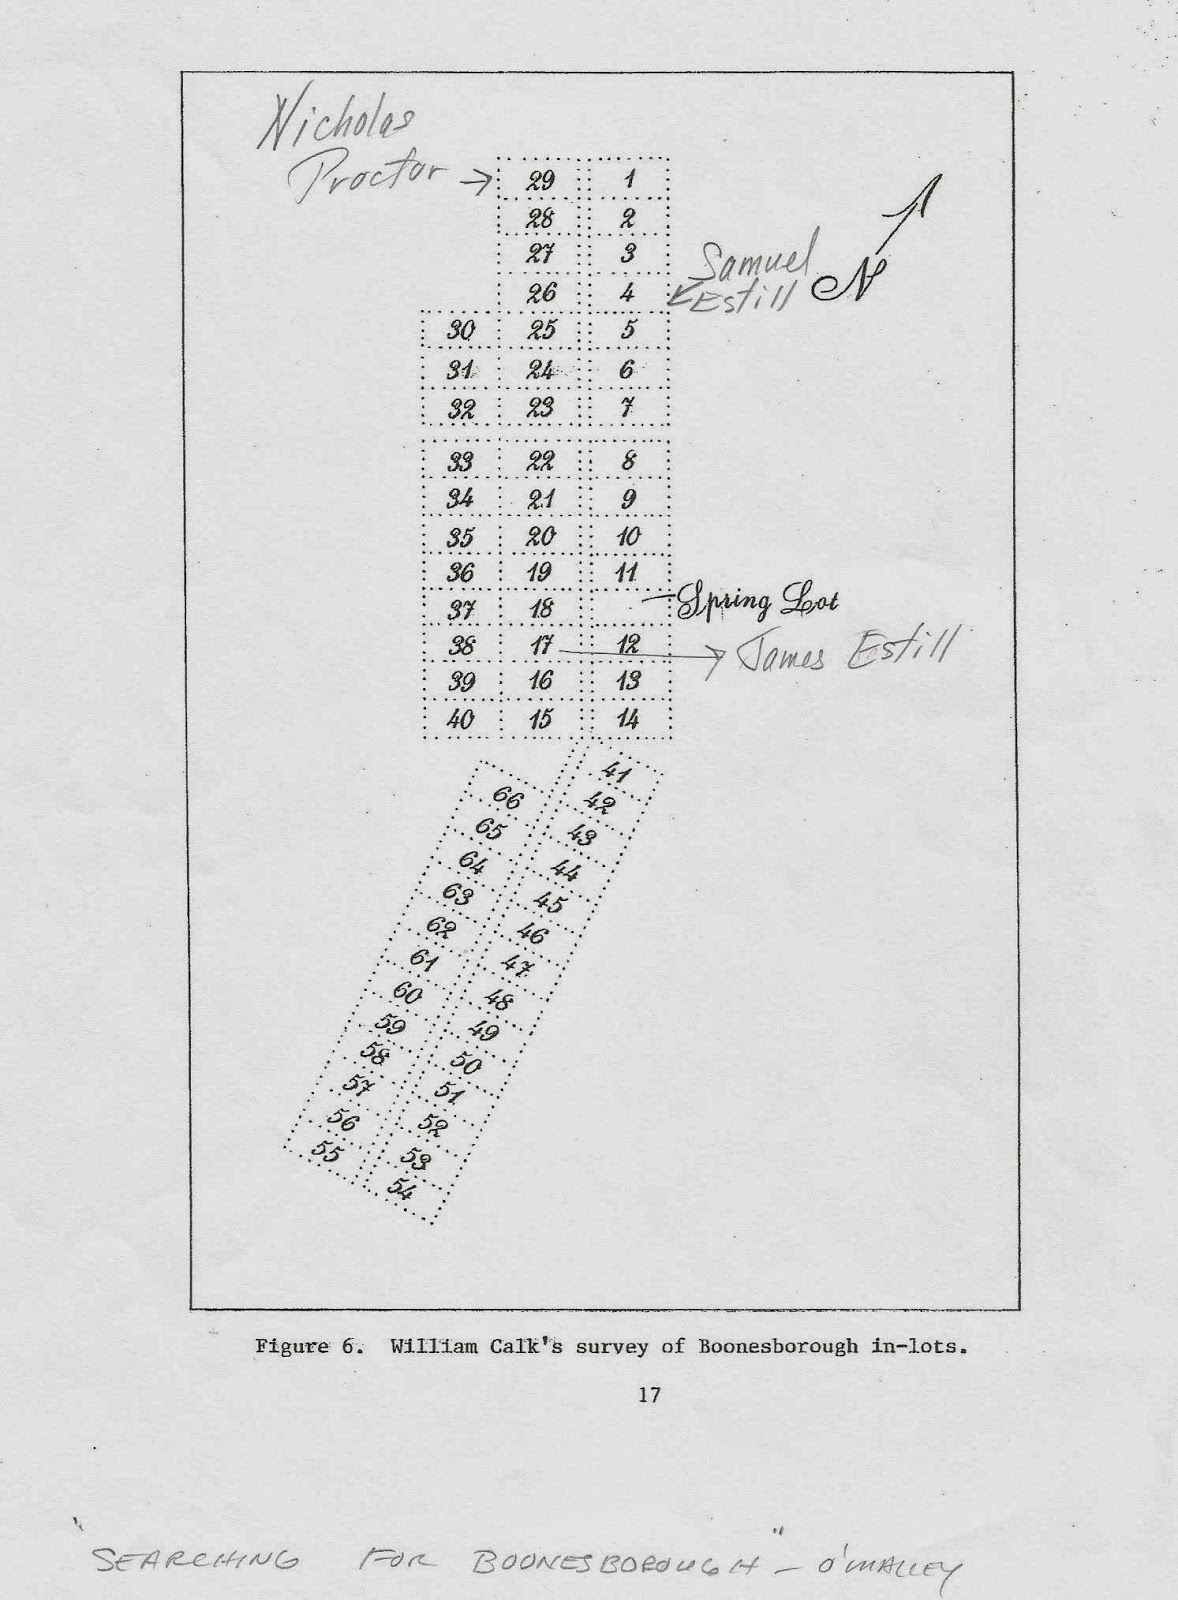 Kentucky Genealogy: NICHOLAS PROCTOR 1756-1835